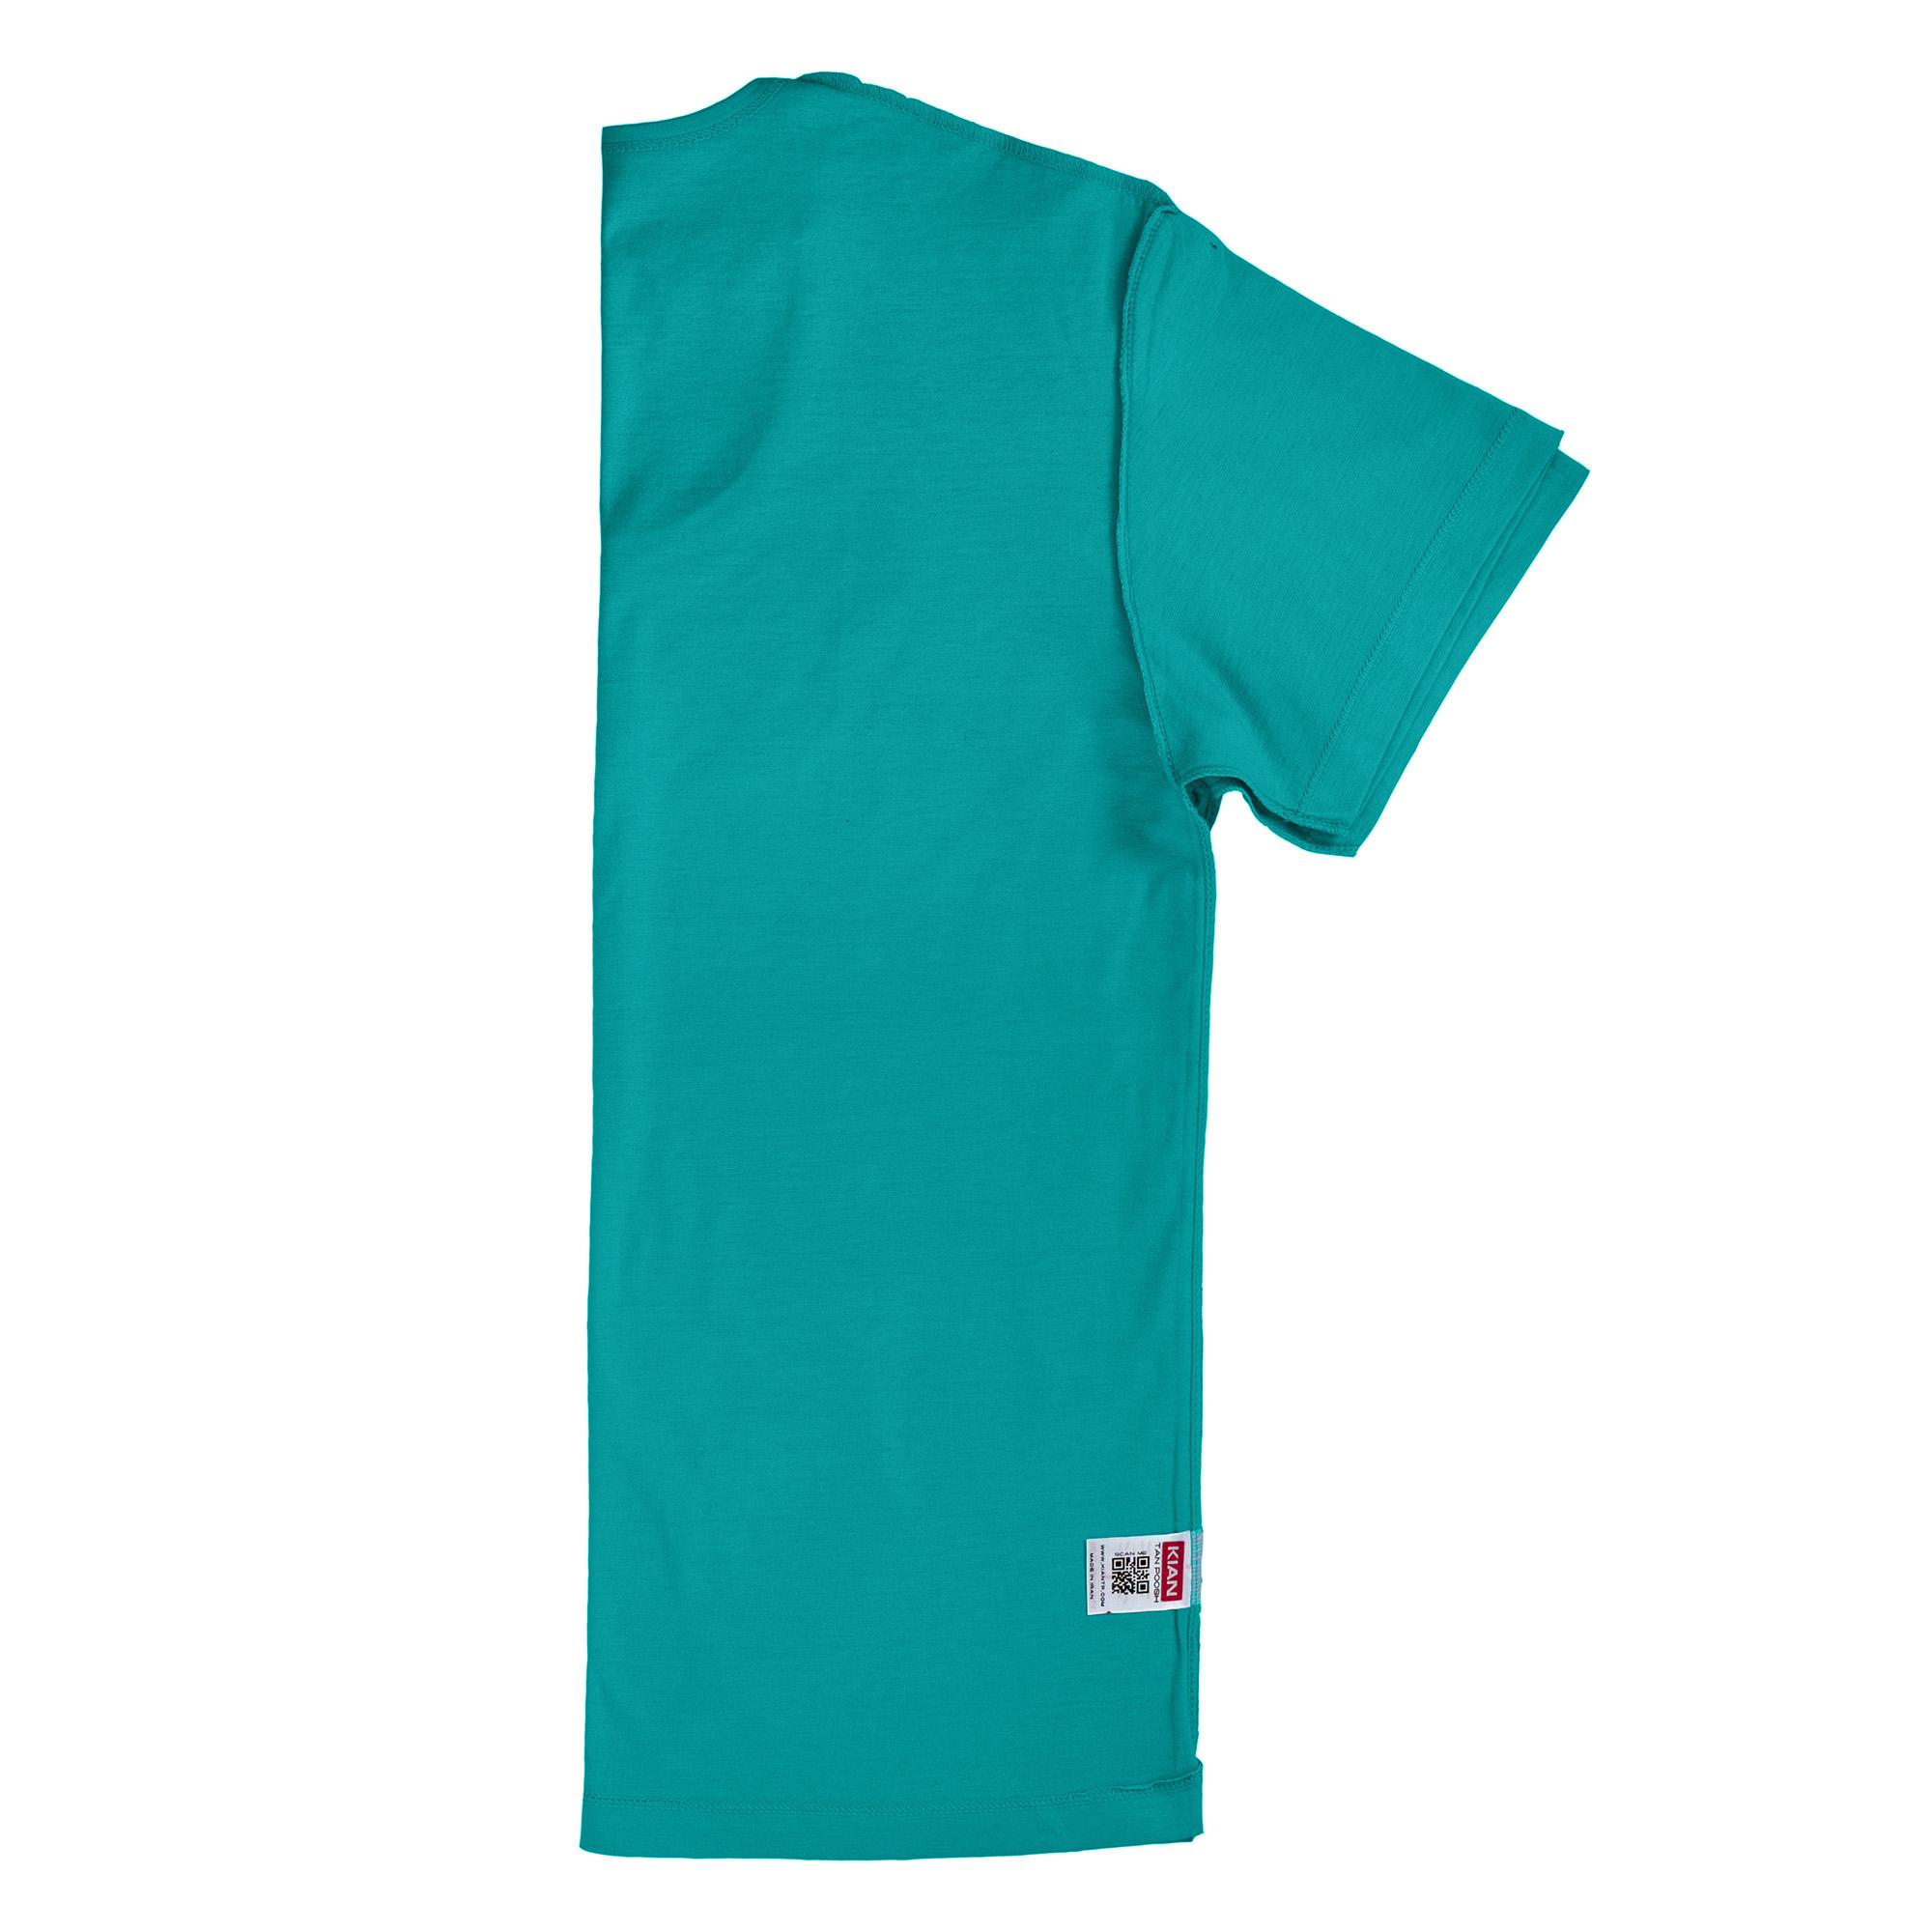 زیرپوش مردانه کیان تن پوش مدل U Neck Shirt Classic HG main 1 2